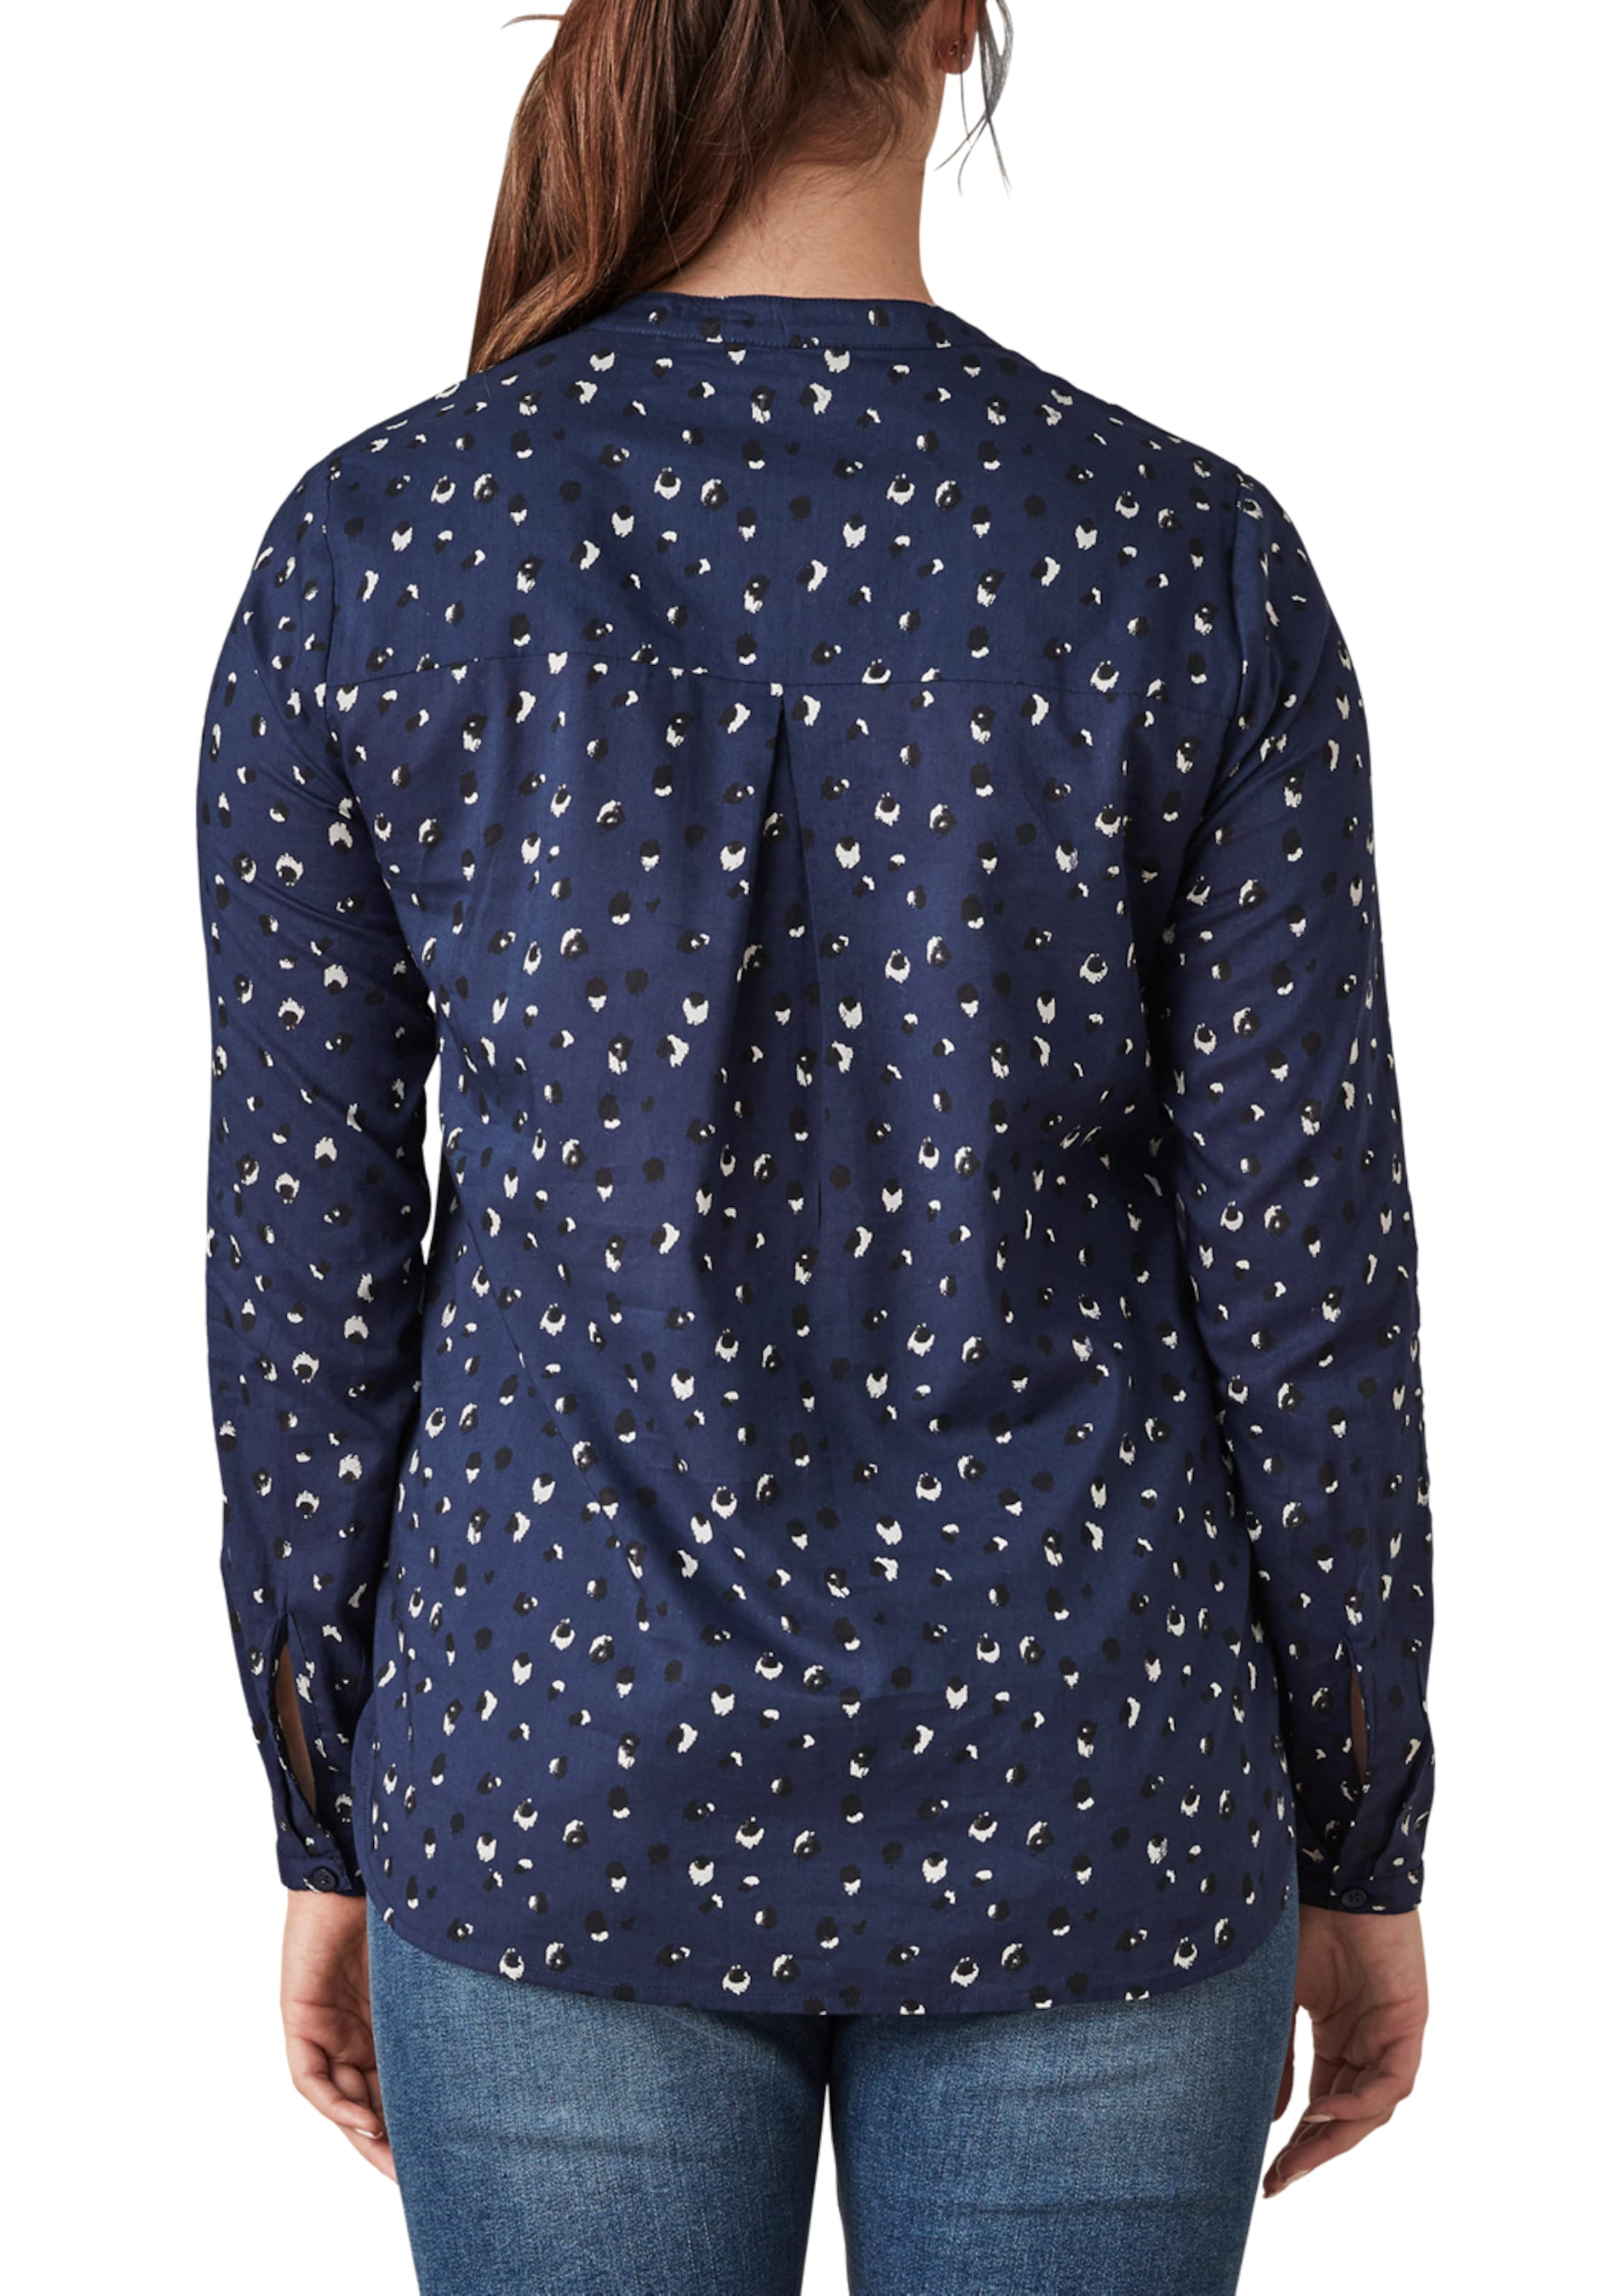 In Triangle NavySchwarz Weiß In NavySchwarz Weiß Triangle Bluse Bluse wPXiuTZOkl